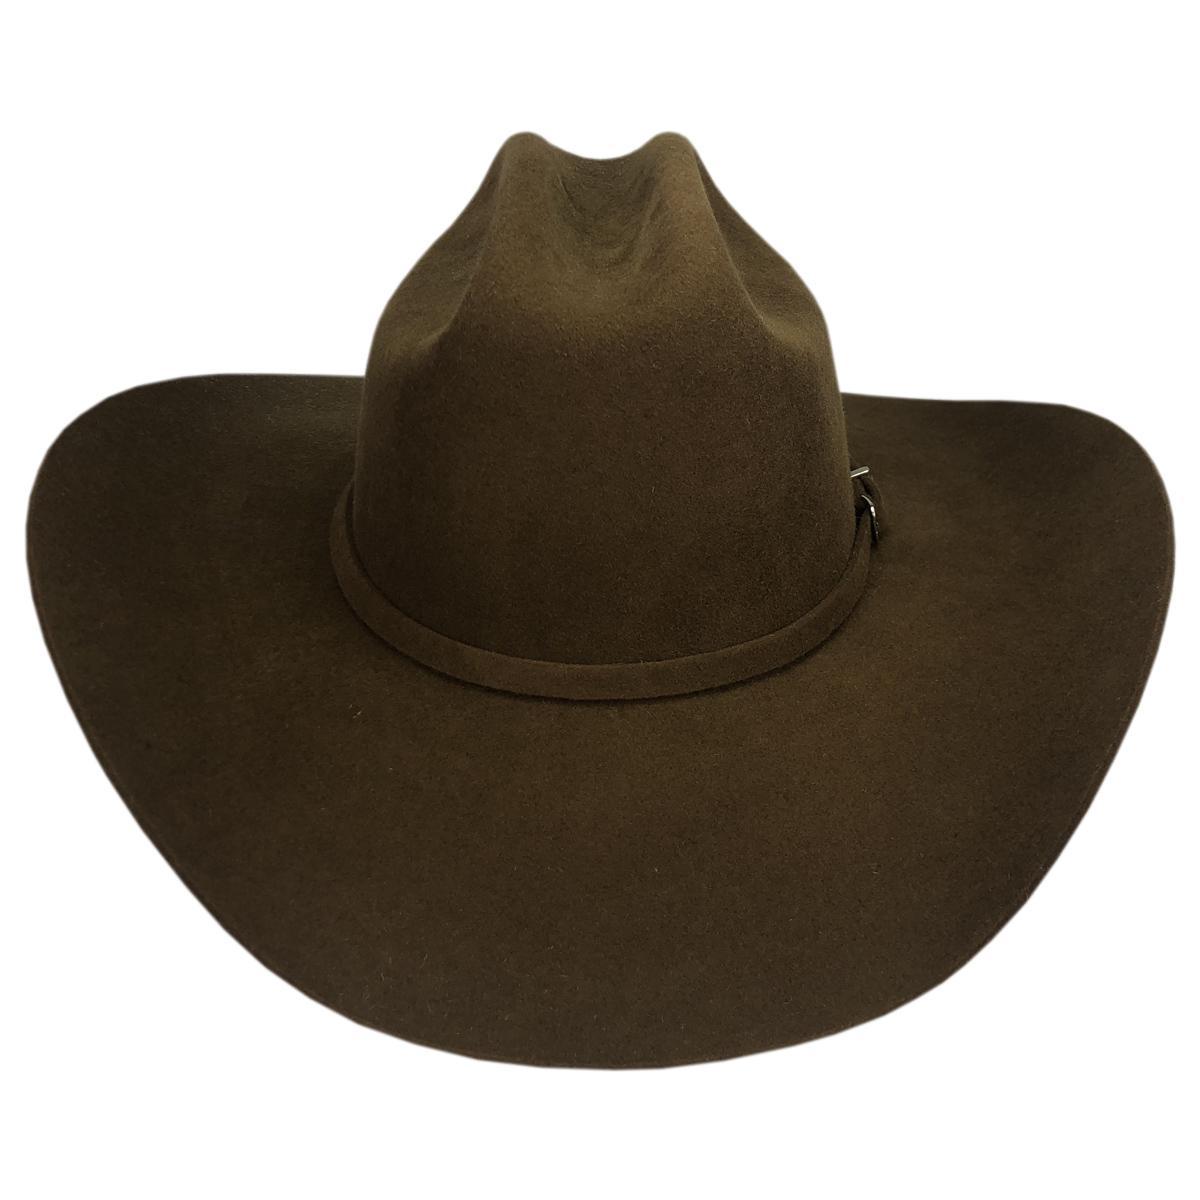 Chapéu americano lã marrom ref 401 tam g - a1p7lanmarrom - Chapéus mundial  R  166 3f61bf8e251